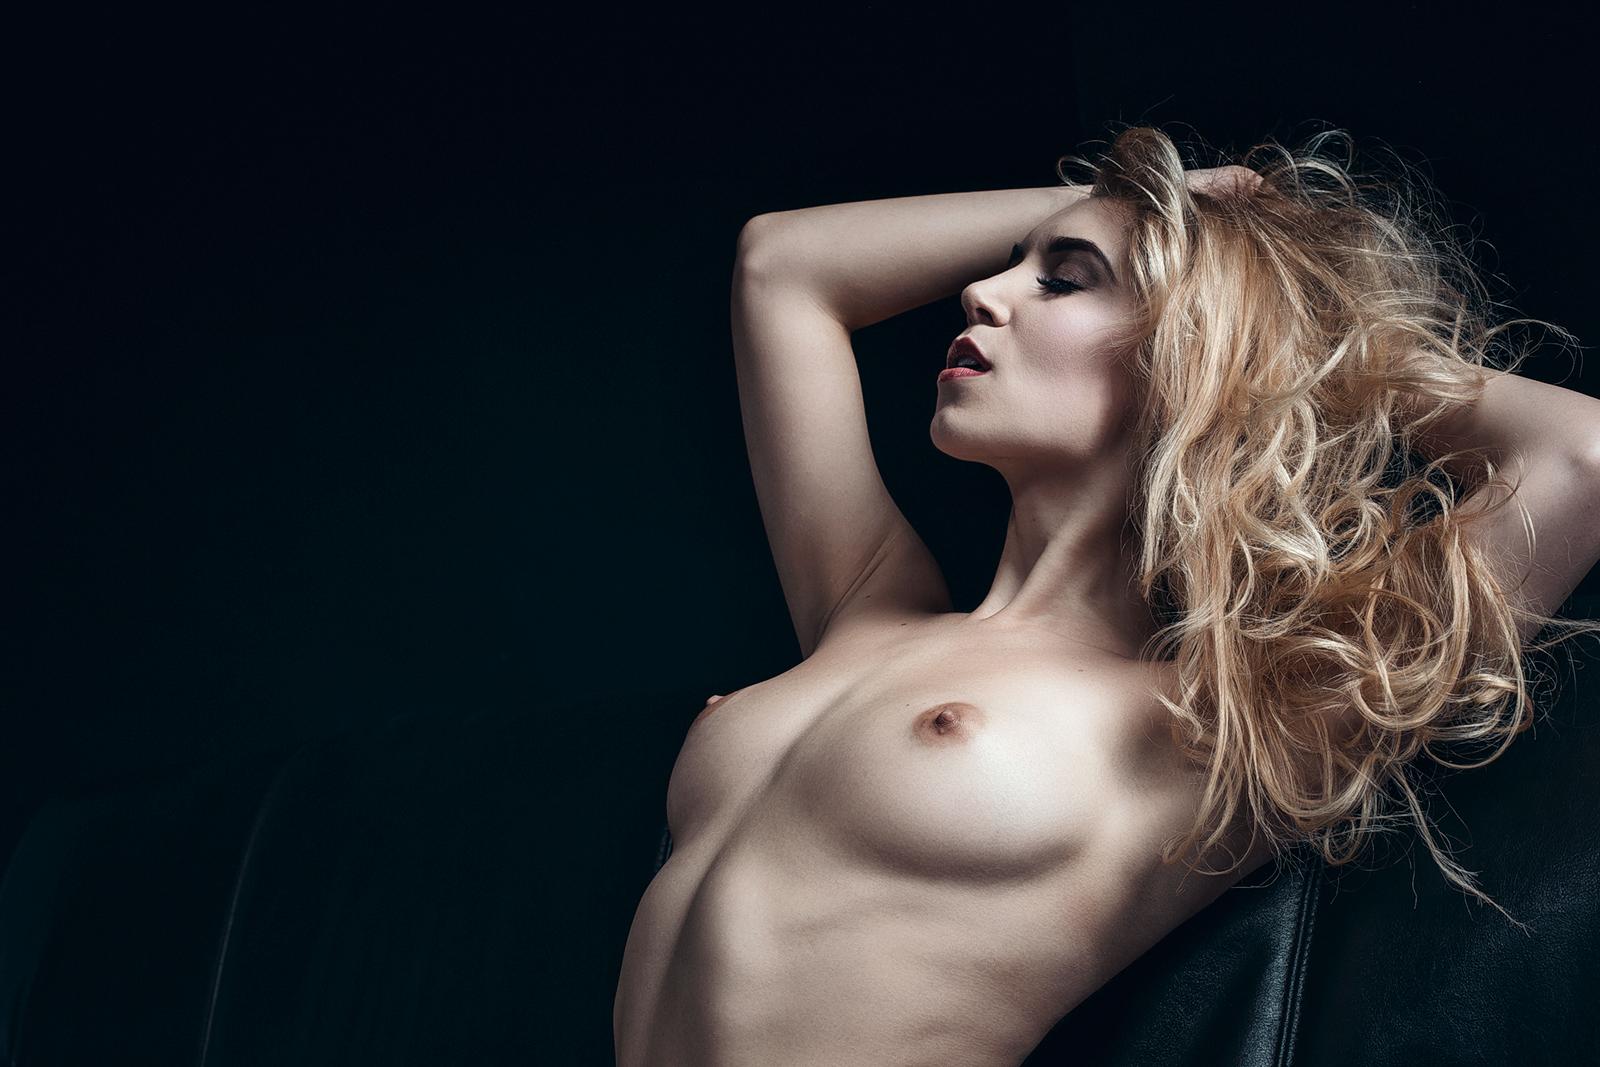 Playboy Model Bionada S Akt Fotoshooting auf Couch im Fotostudio